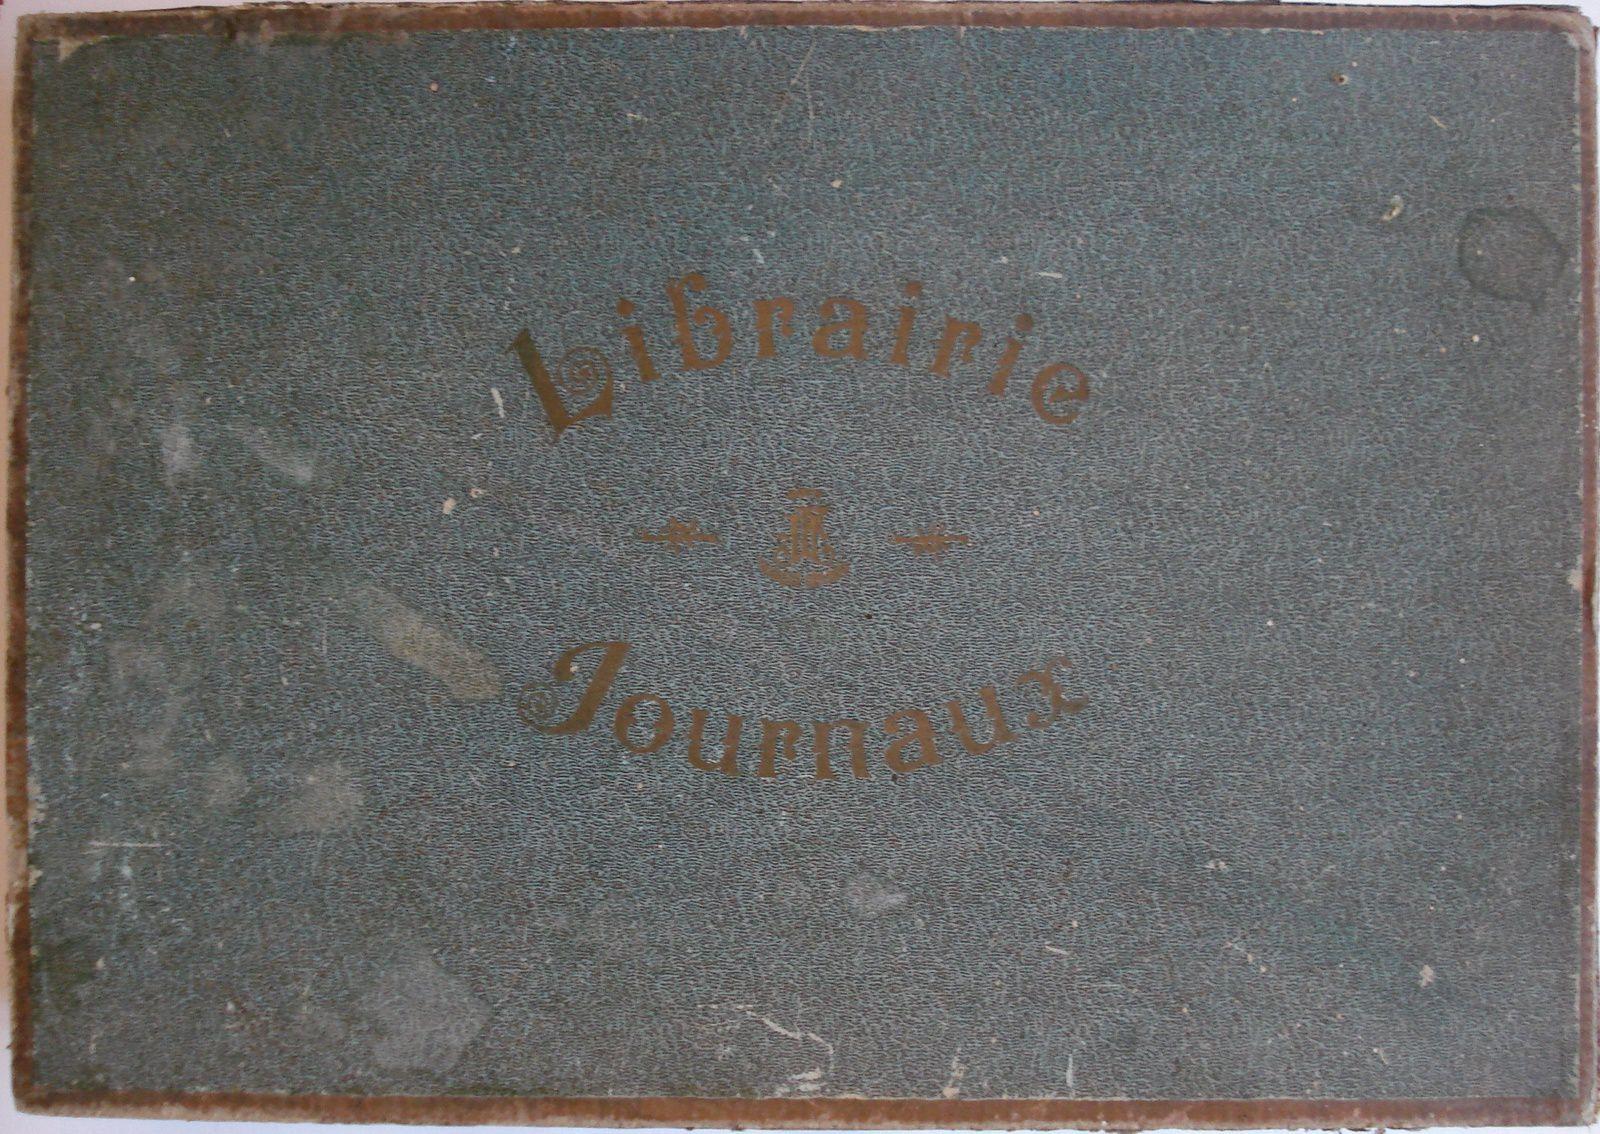 revue de presse 1900 avec JJF